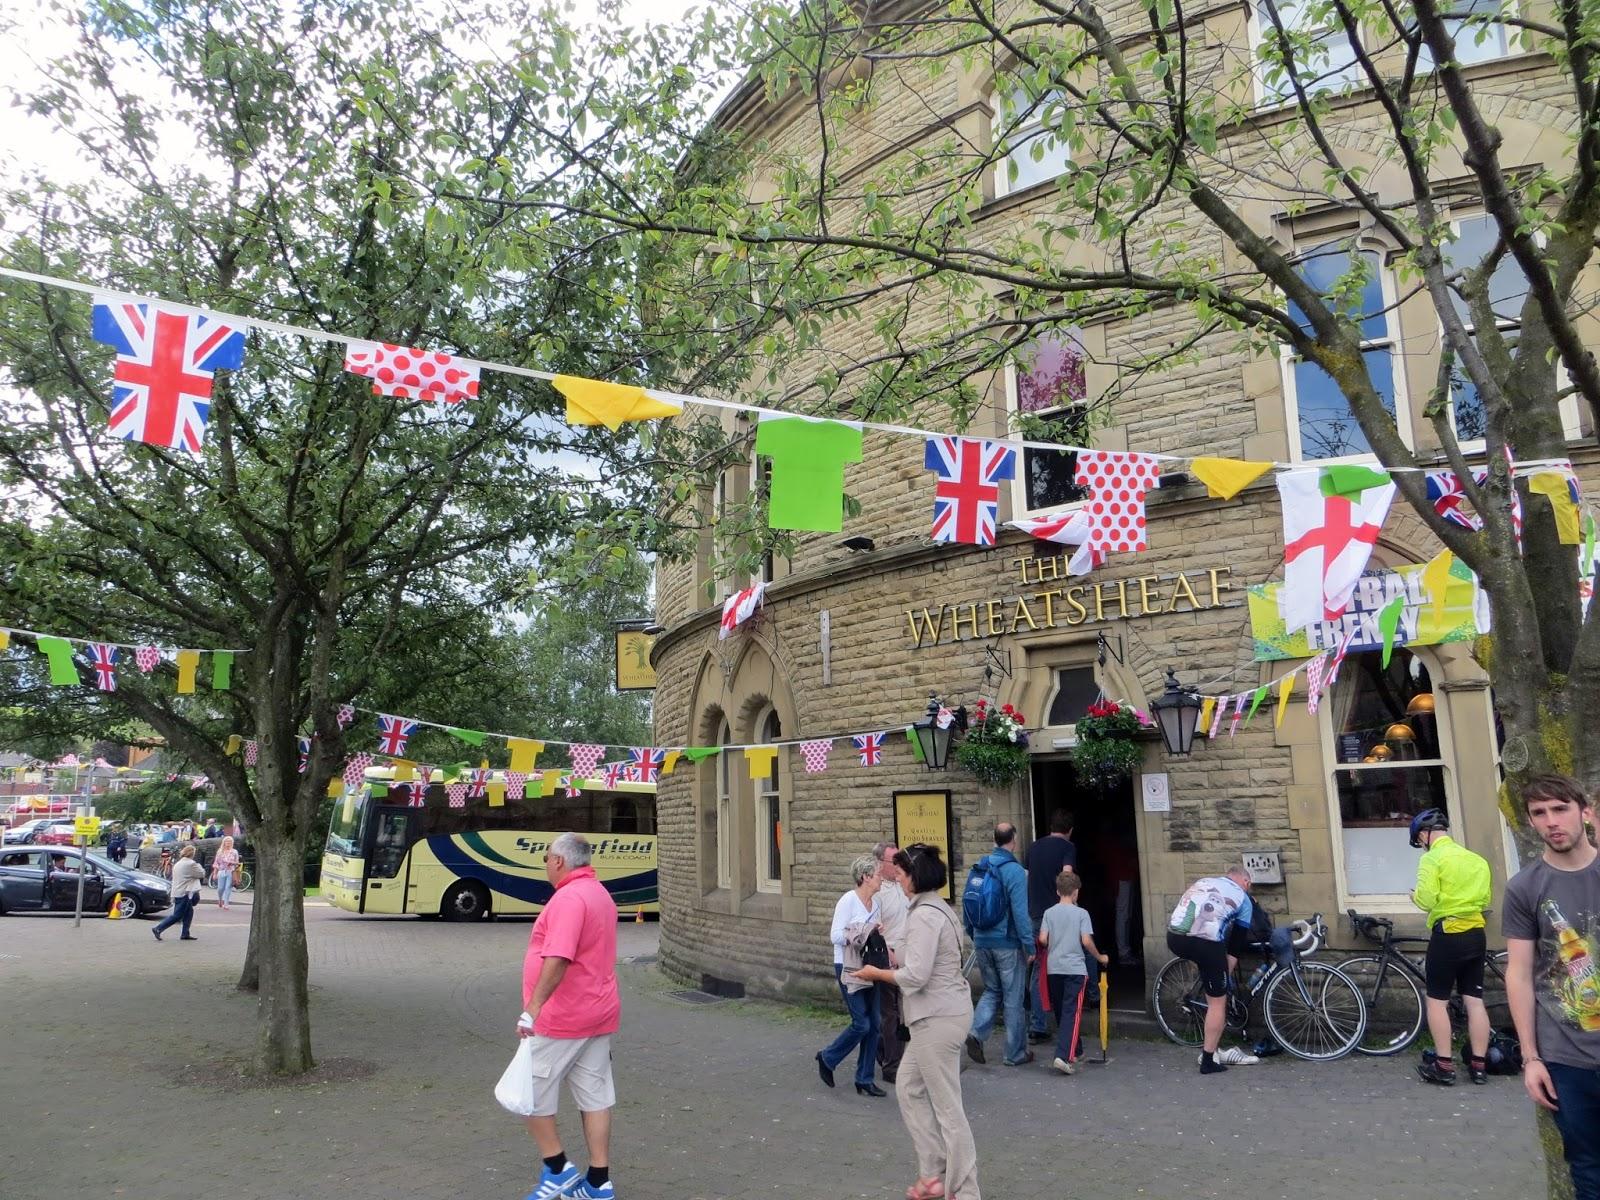 roundhouse, bunting, village, wheatsheaf pub, traditional, le tour de france, le tour, the tour de france, team sky, peloton, yorkshire, lancashire, tour de yorkshire, blackstone edge, cycling, velo, littleborough, greater manchester, rochdale, cragg vale, north west, TDF, 2014, bikes, photography, sport, athletes, cyclists, uk, great Britain, united kingdom, france, french,